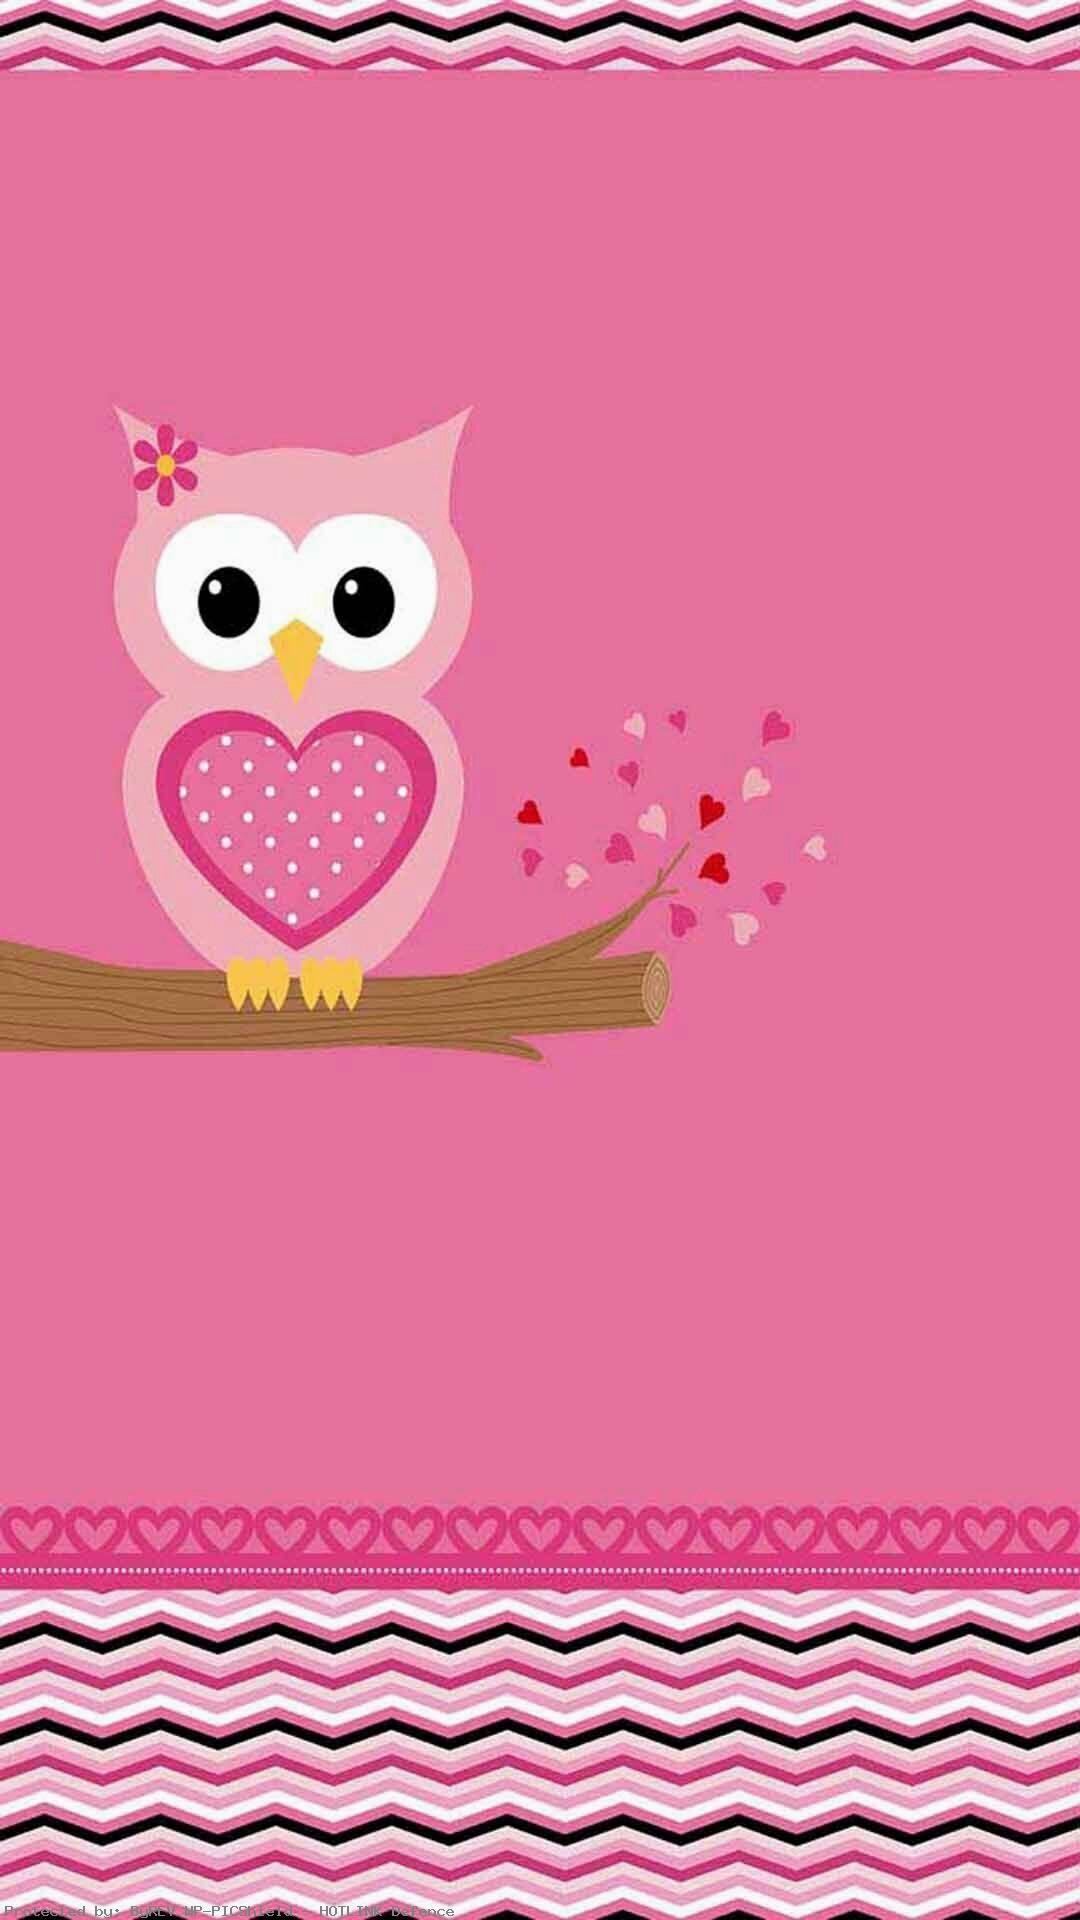 Cute Cartoon Owl Wallpaper 54 Images